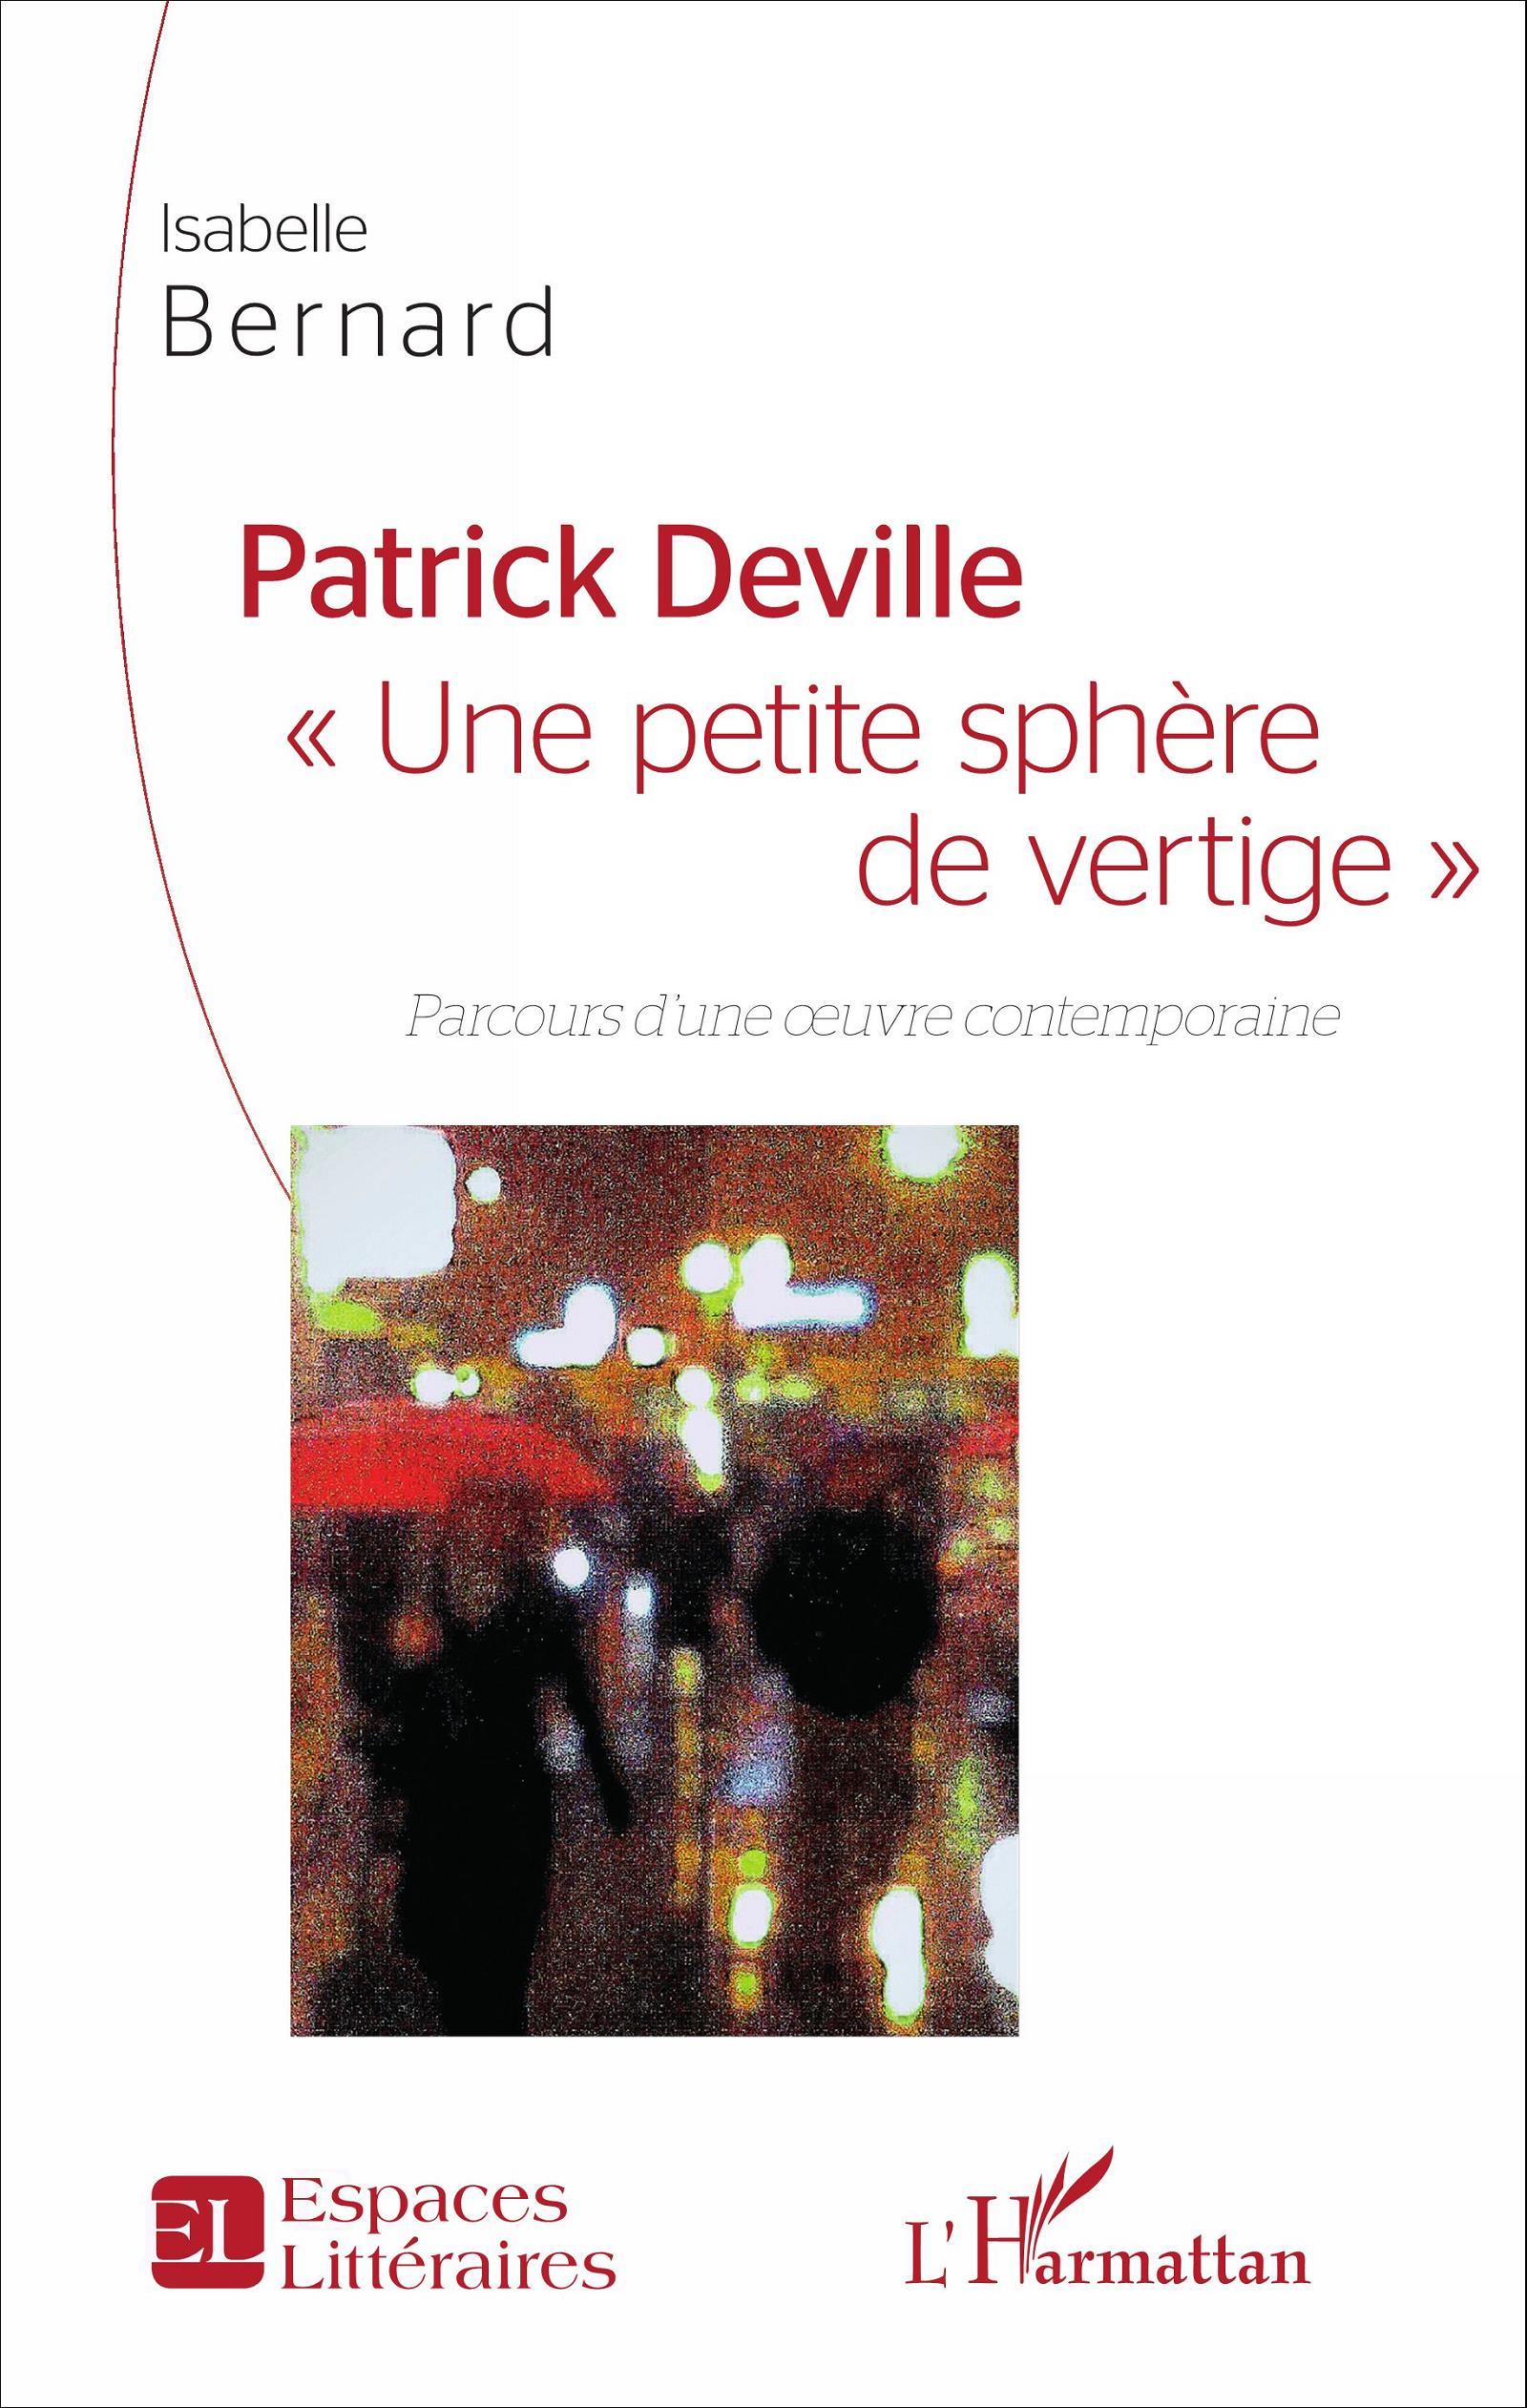 I. Bernard, Patrick Deville -